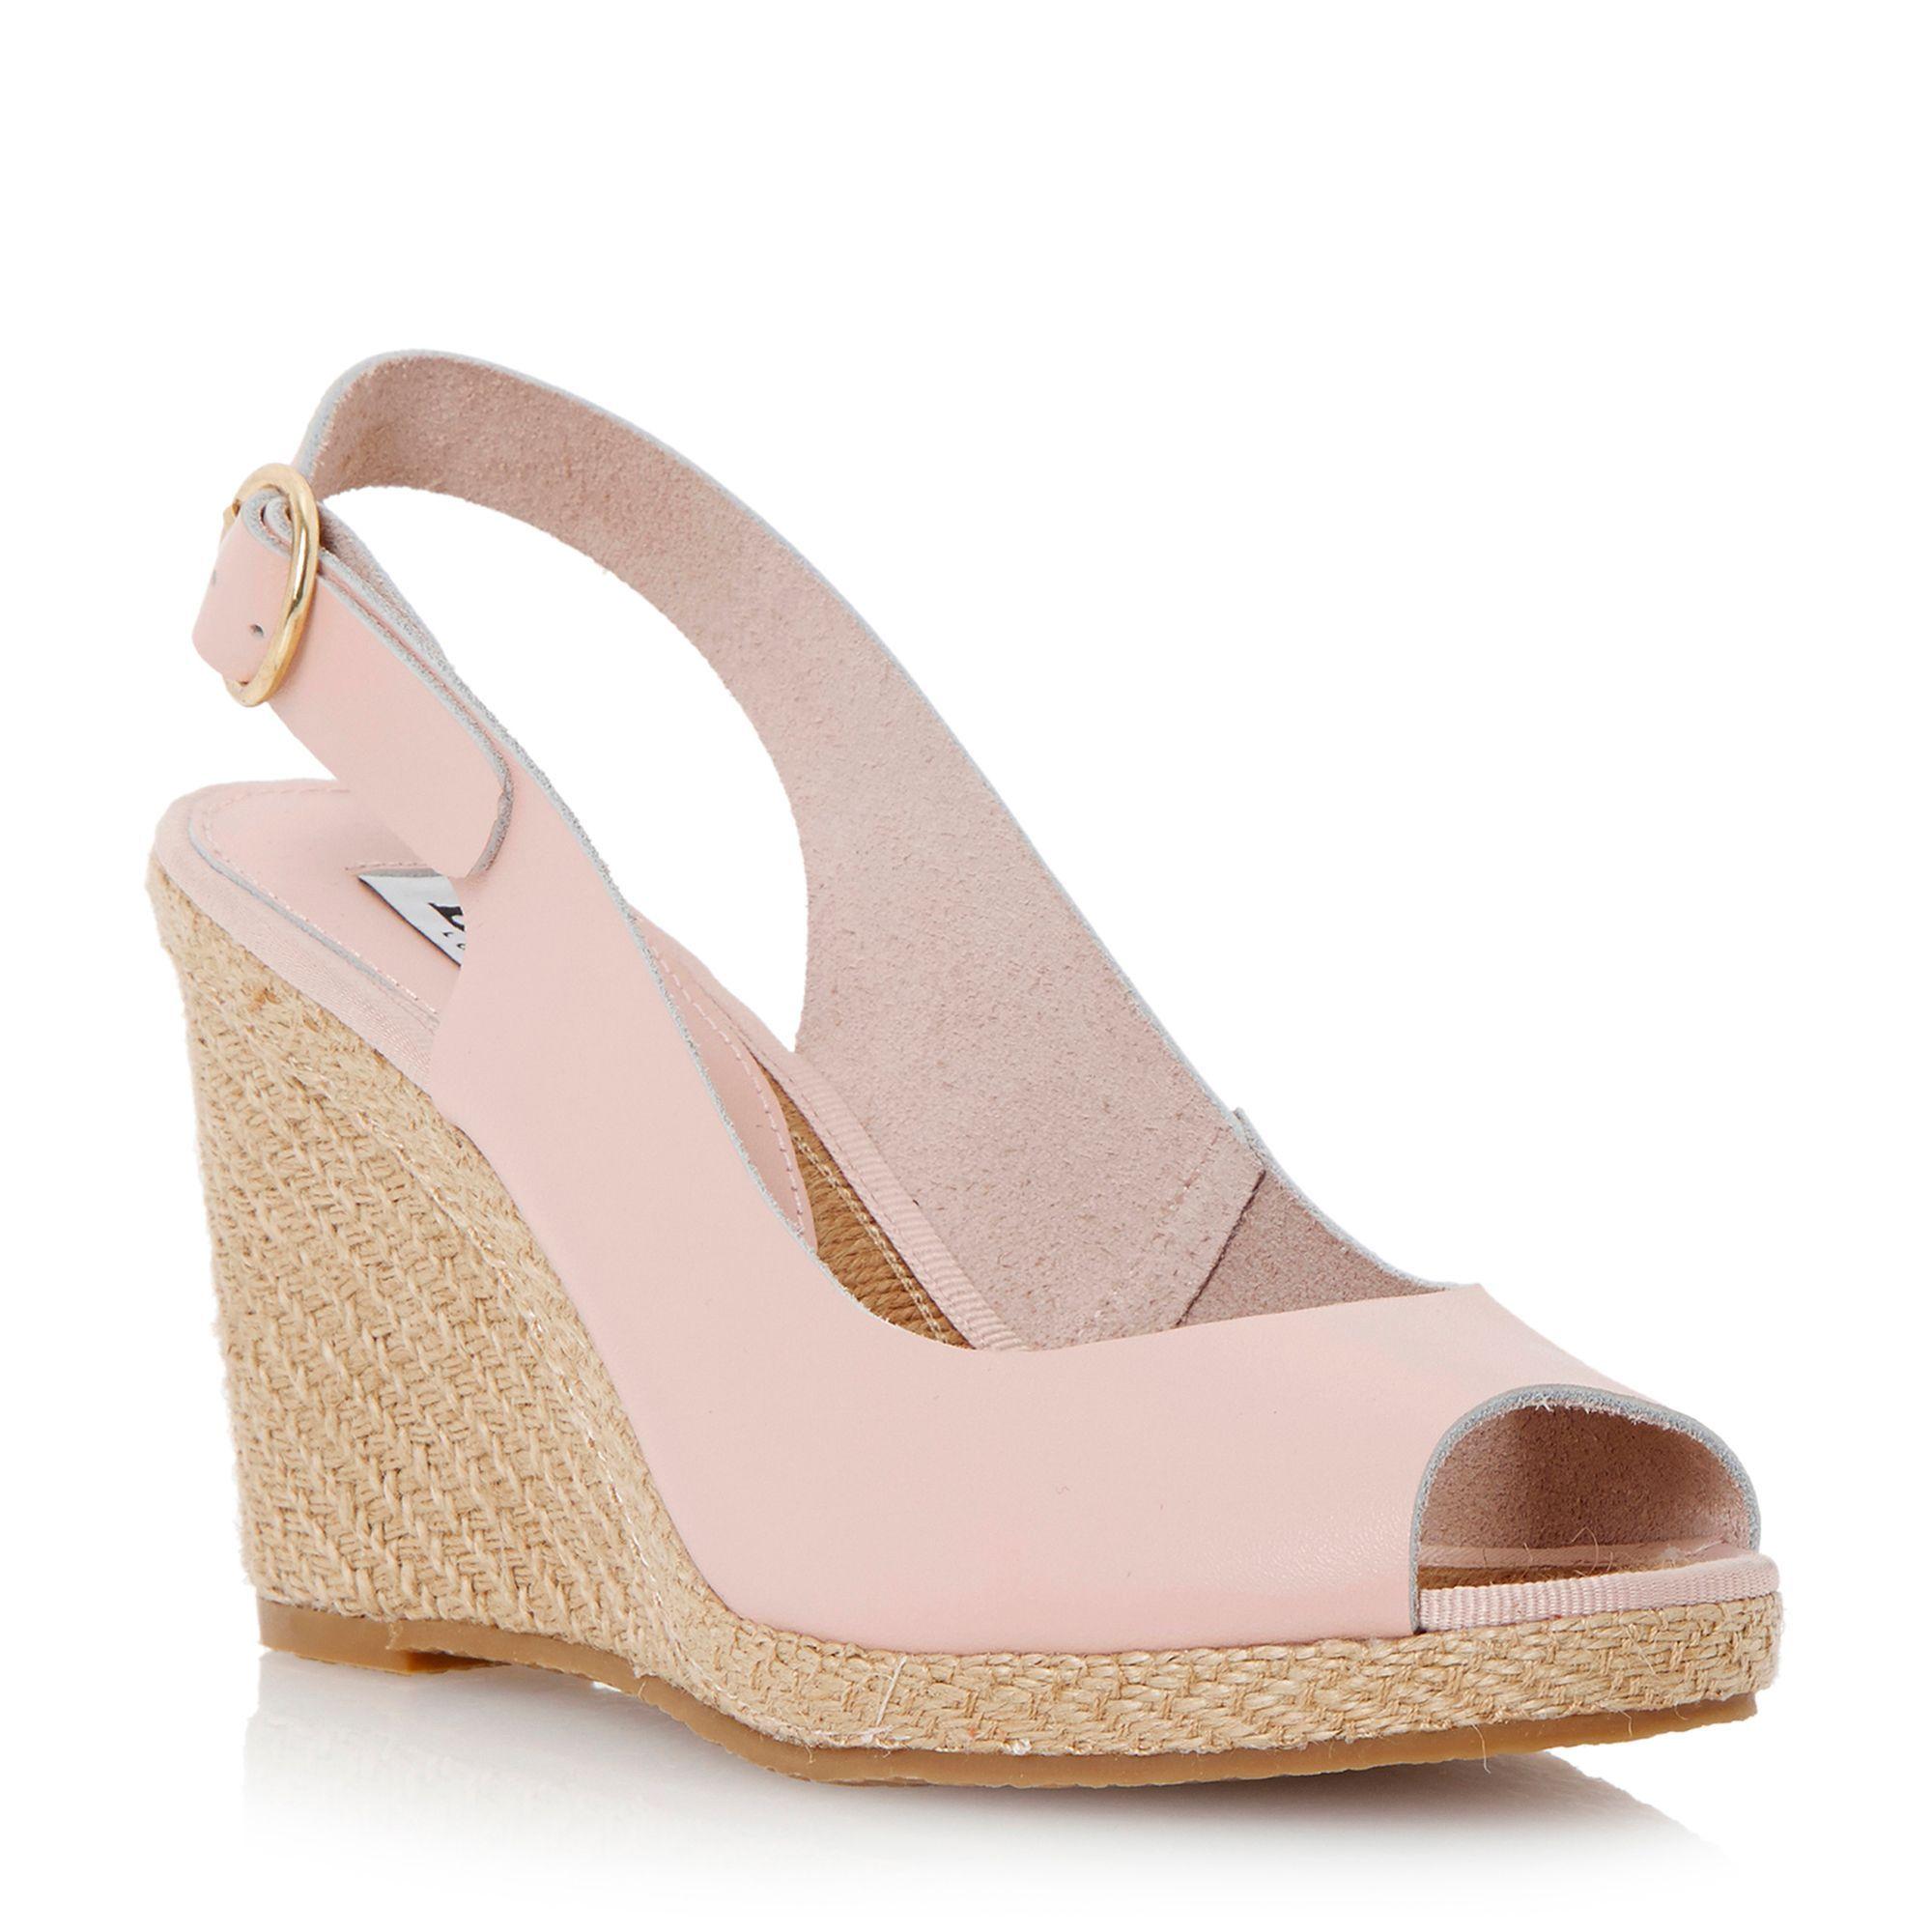 df95400d1b0 Dune Gleeful espadrille slingback wedge sandals